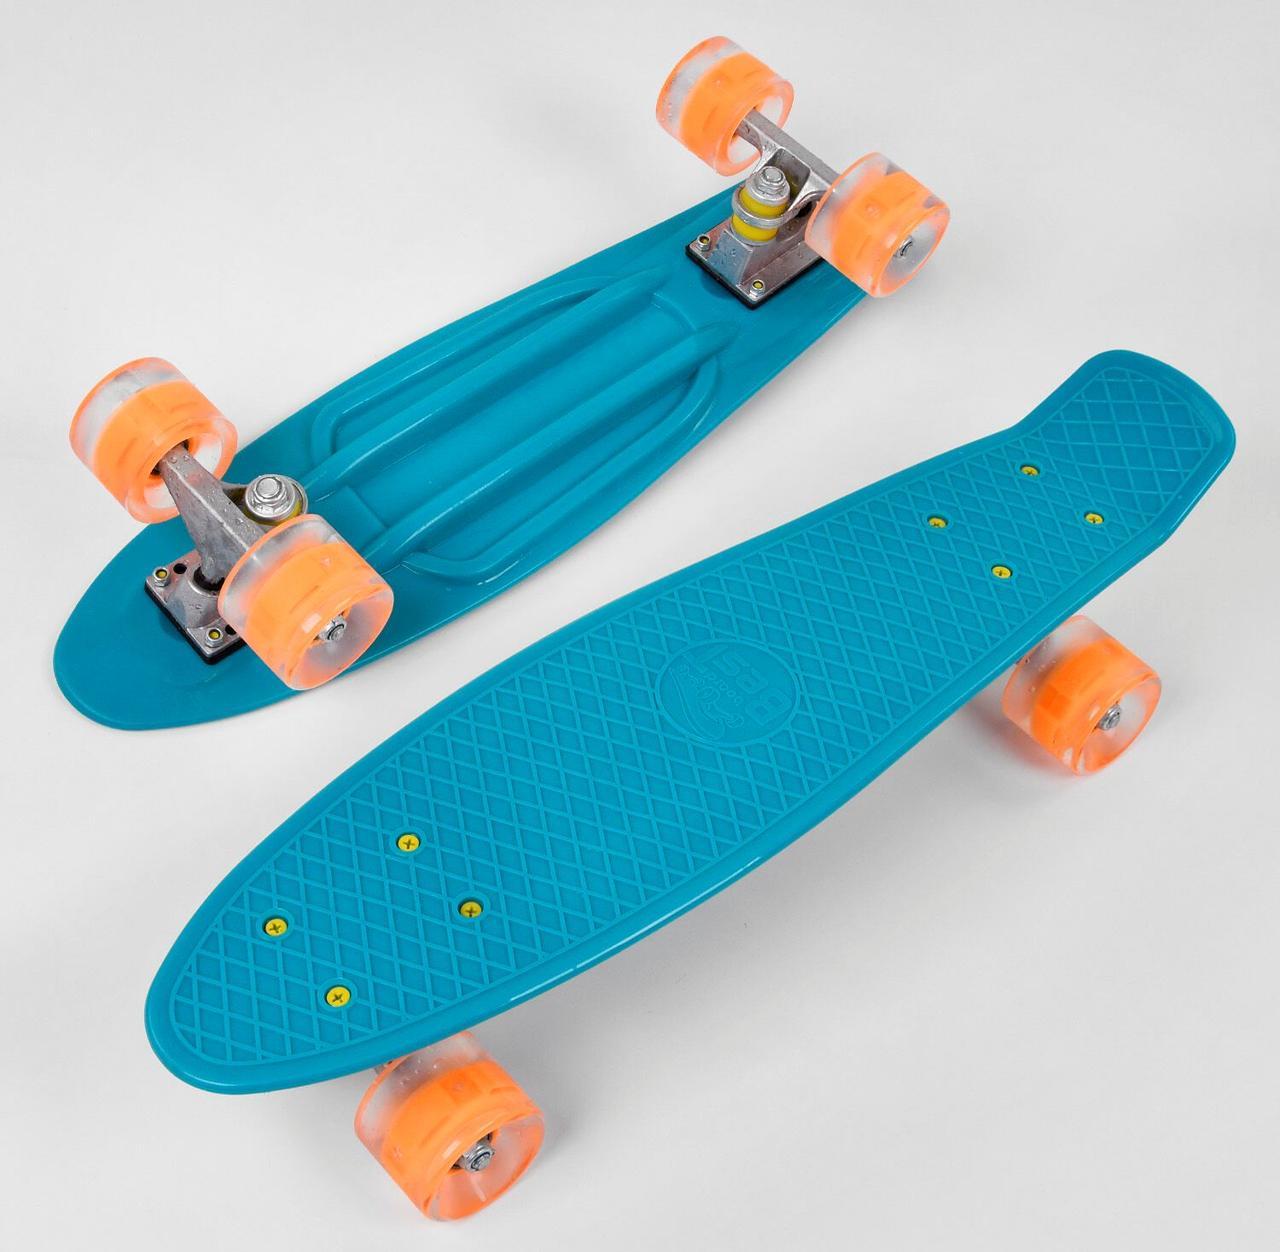 3131 Скейт Пенни борд Best Board, бирюзовый, доска в длину 55 см, колёса PU со светом, диаметр 6 см